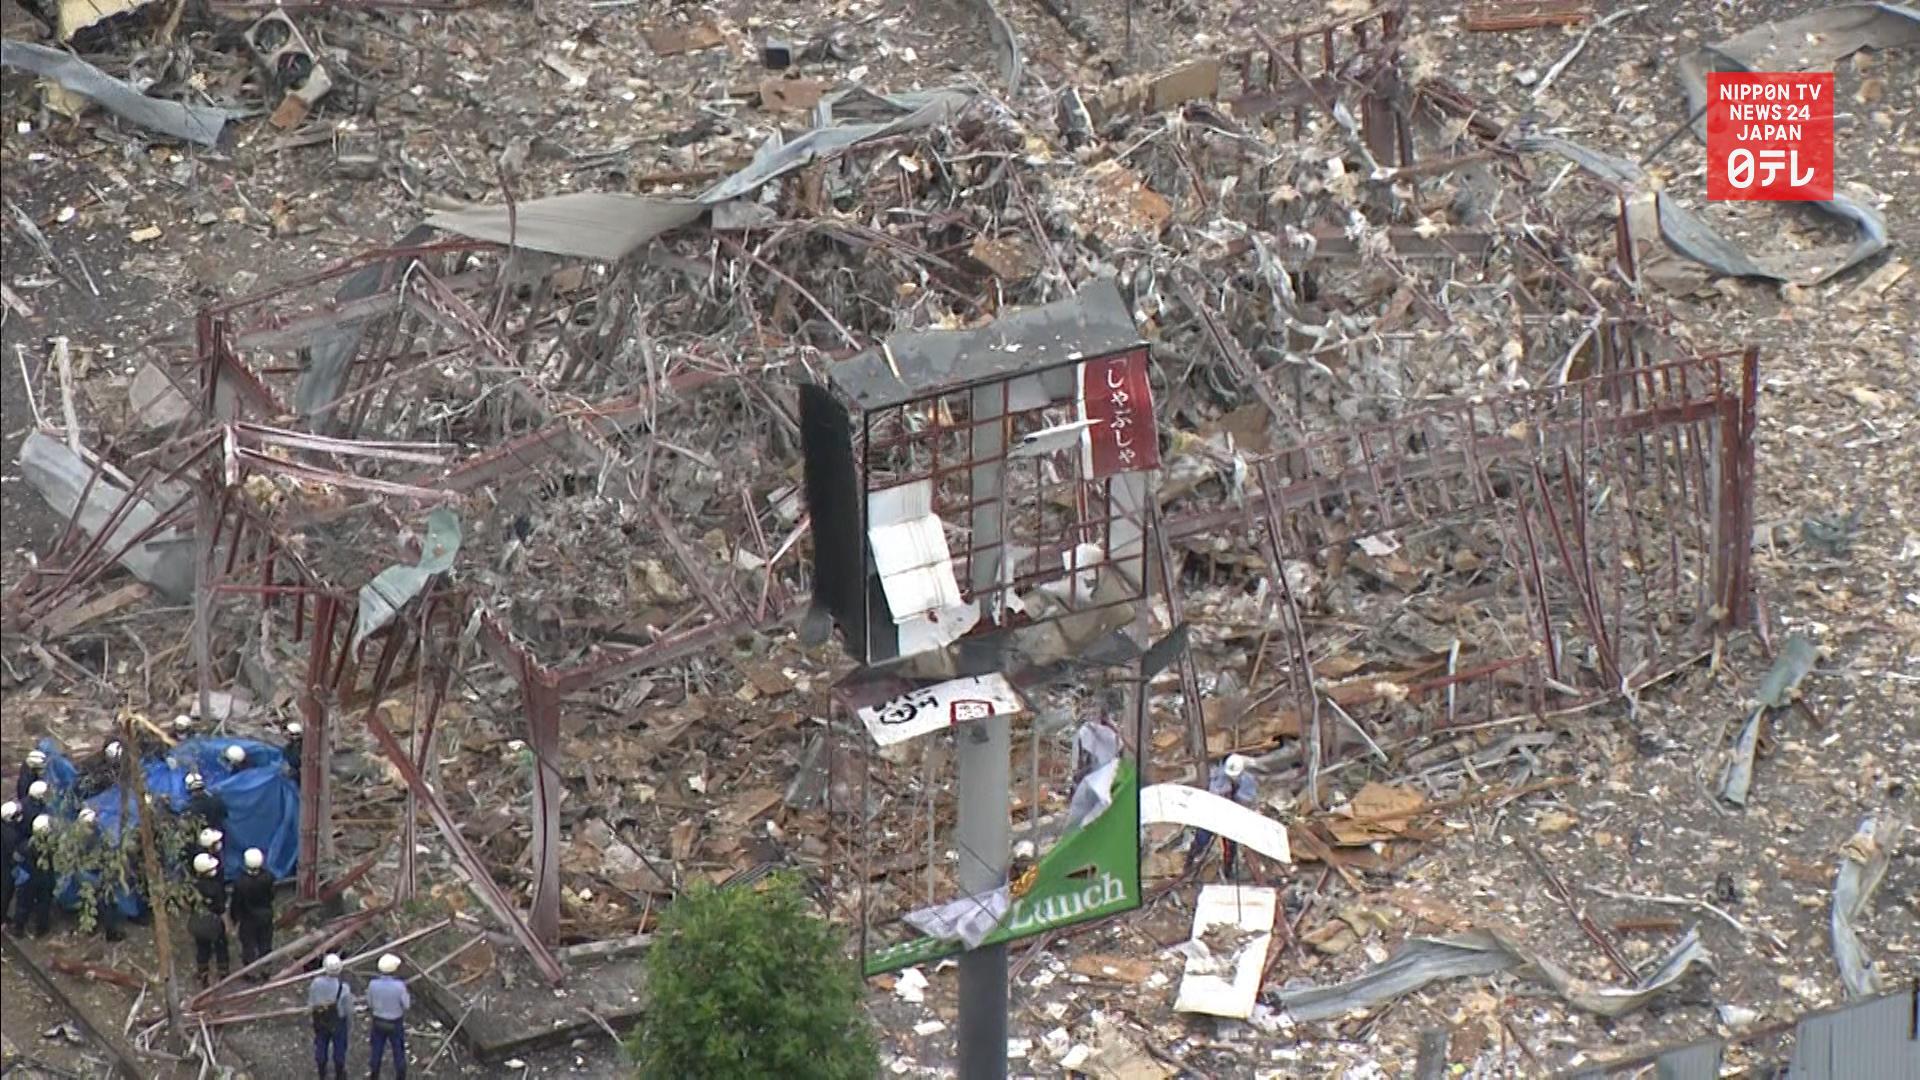 1 dead, 18 hurt in Fukushima explosion